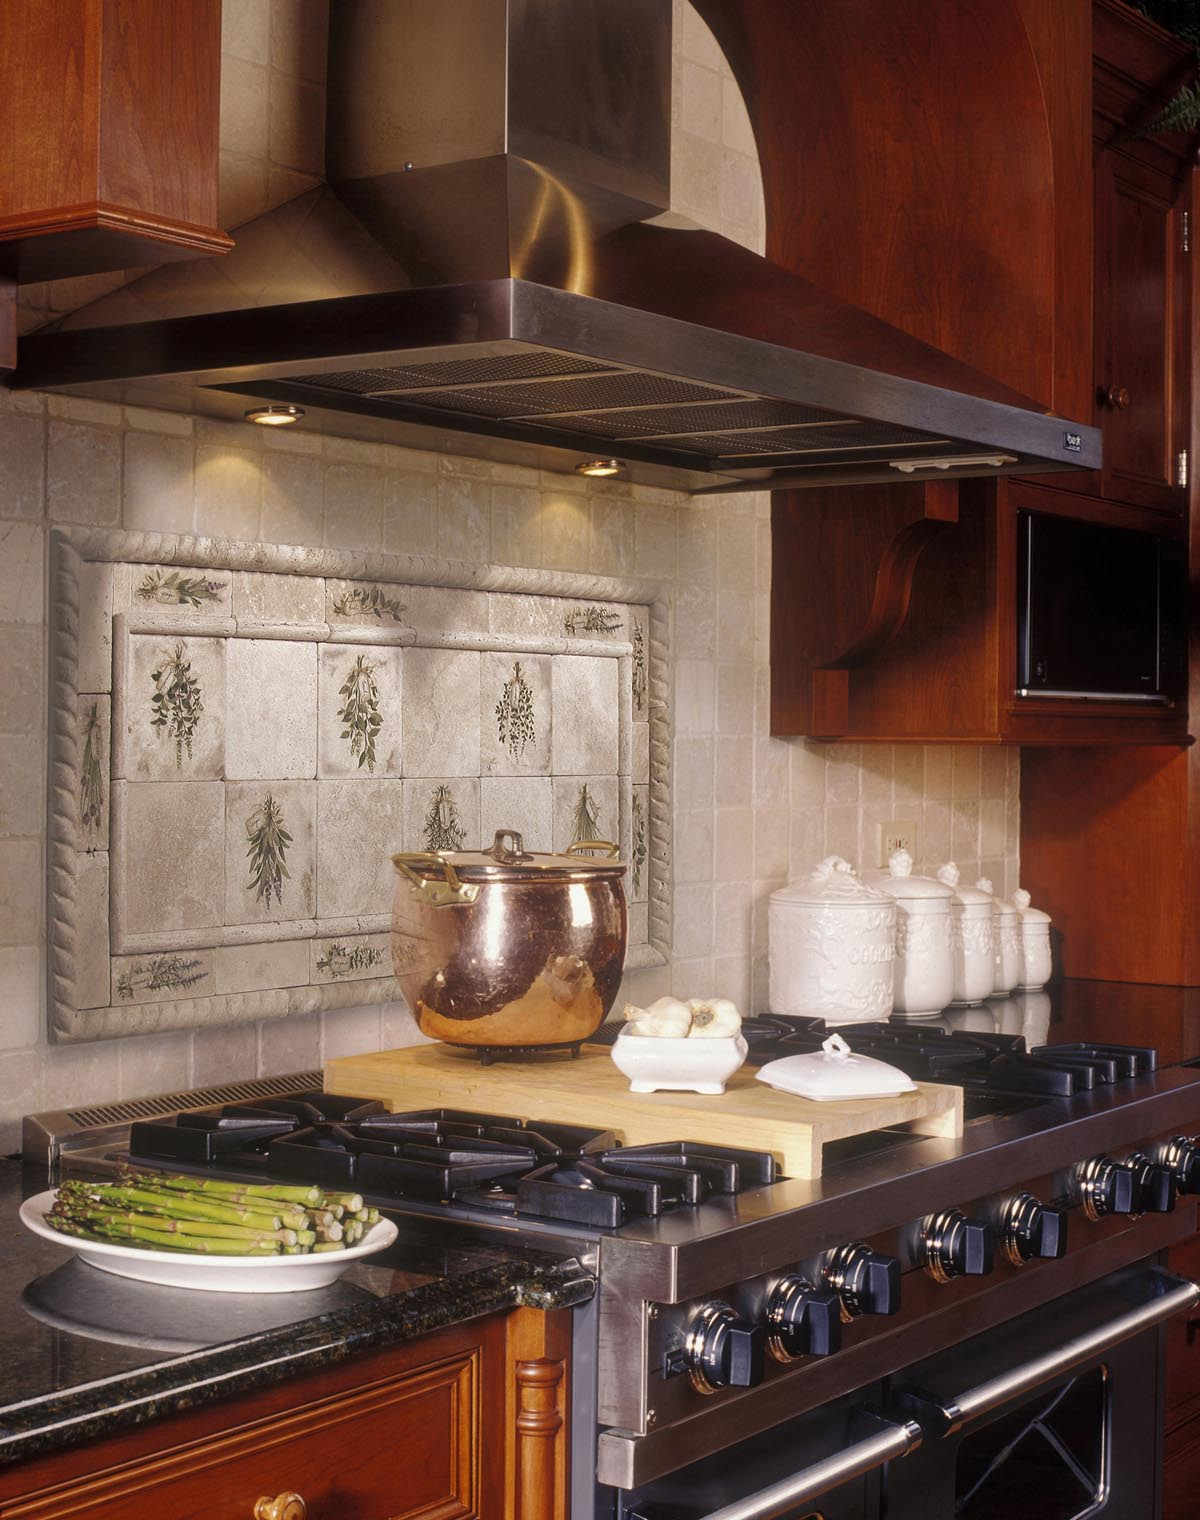 Kitchen Decorating Ideas for White Tiles Kitchen Backsplash Designs with Maple Kitchen Cabinet